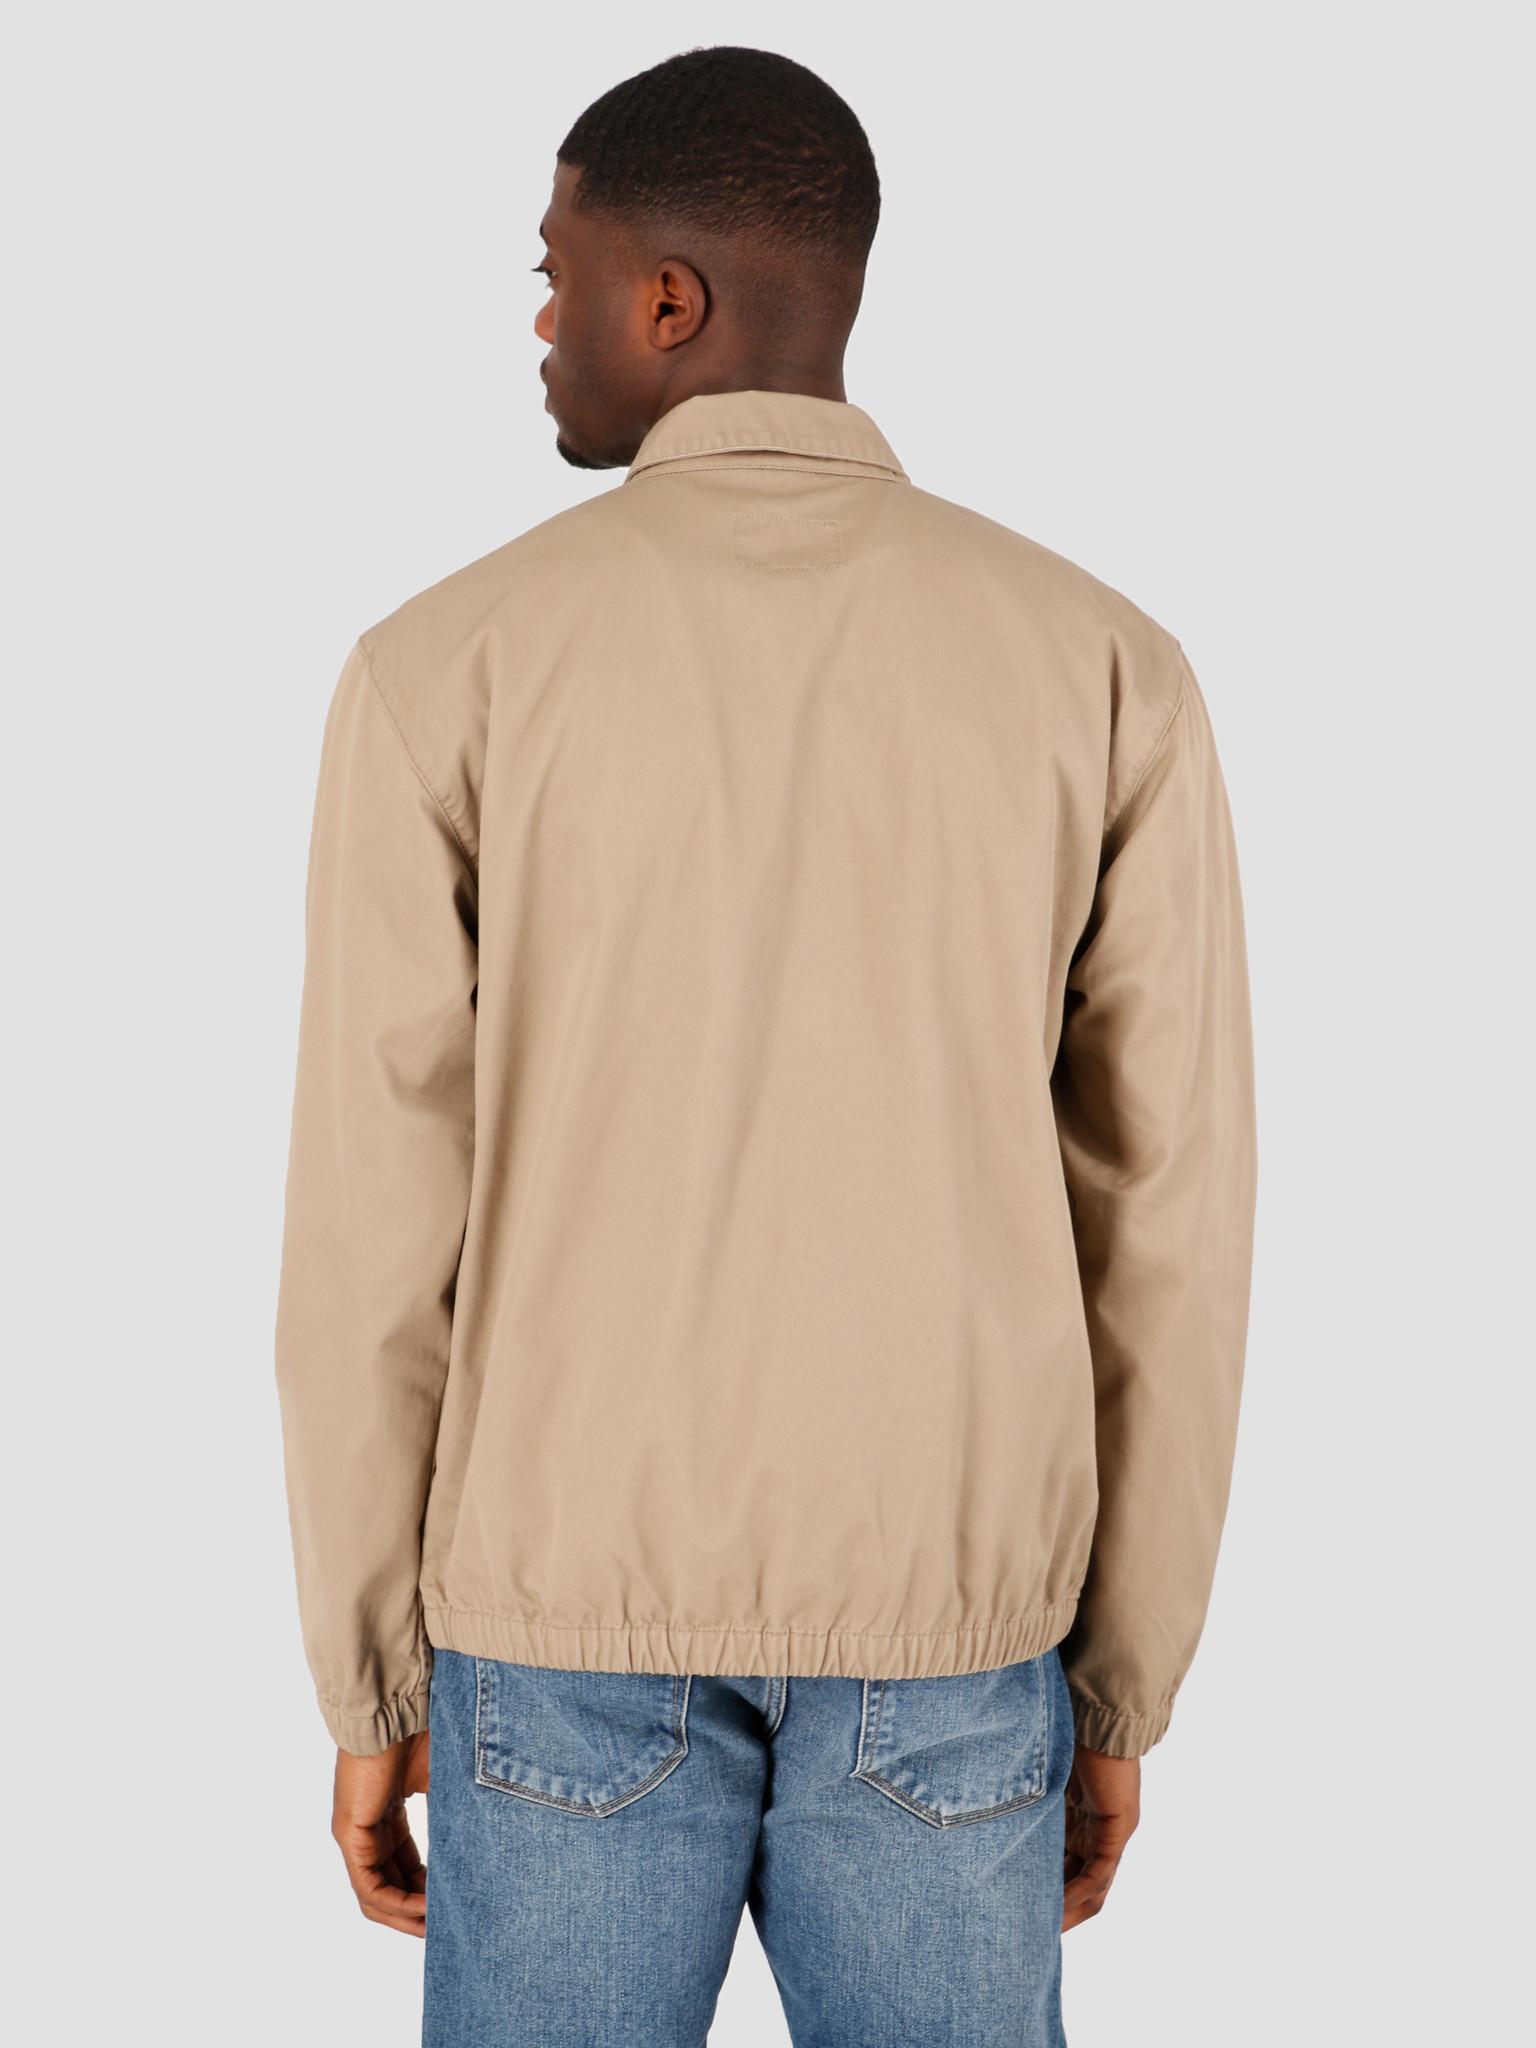 Carhartt WIP Carhartt WIP Madison Jacket Leather Dark Navy Rinsed I026487-8Y02